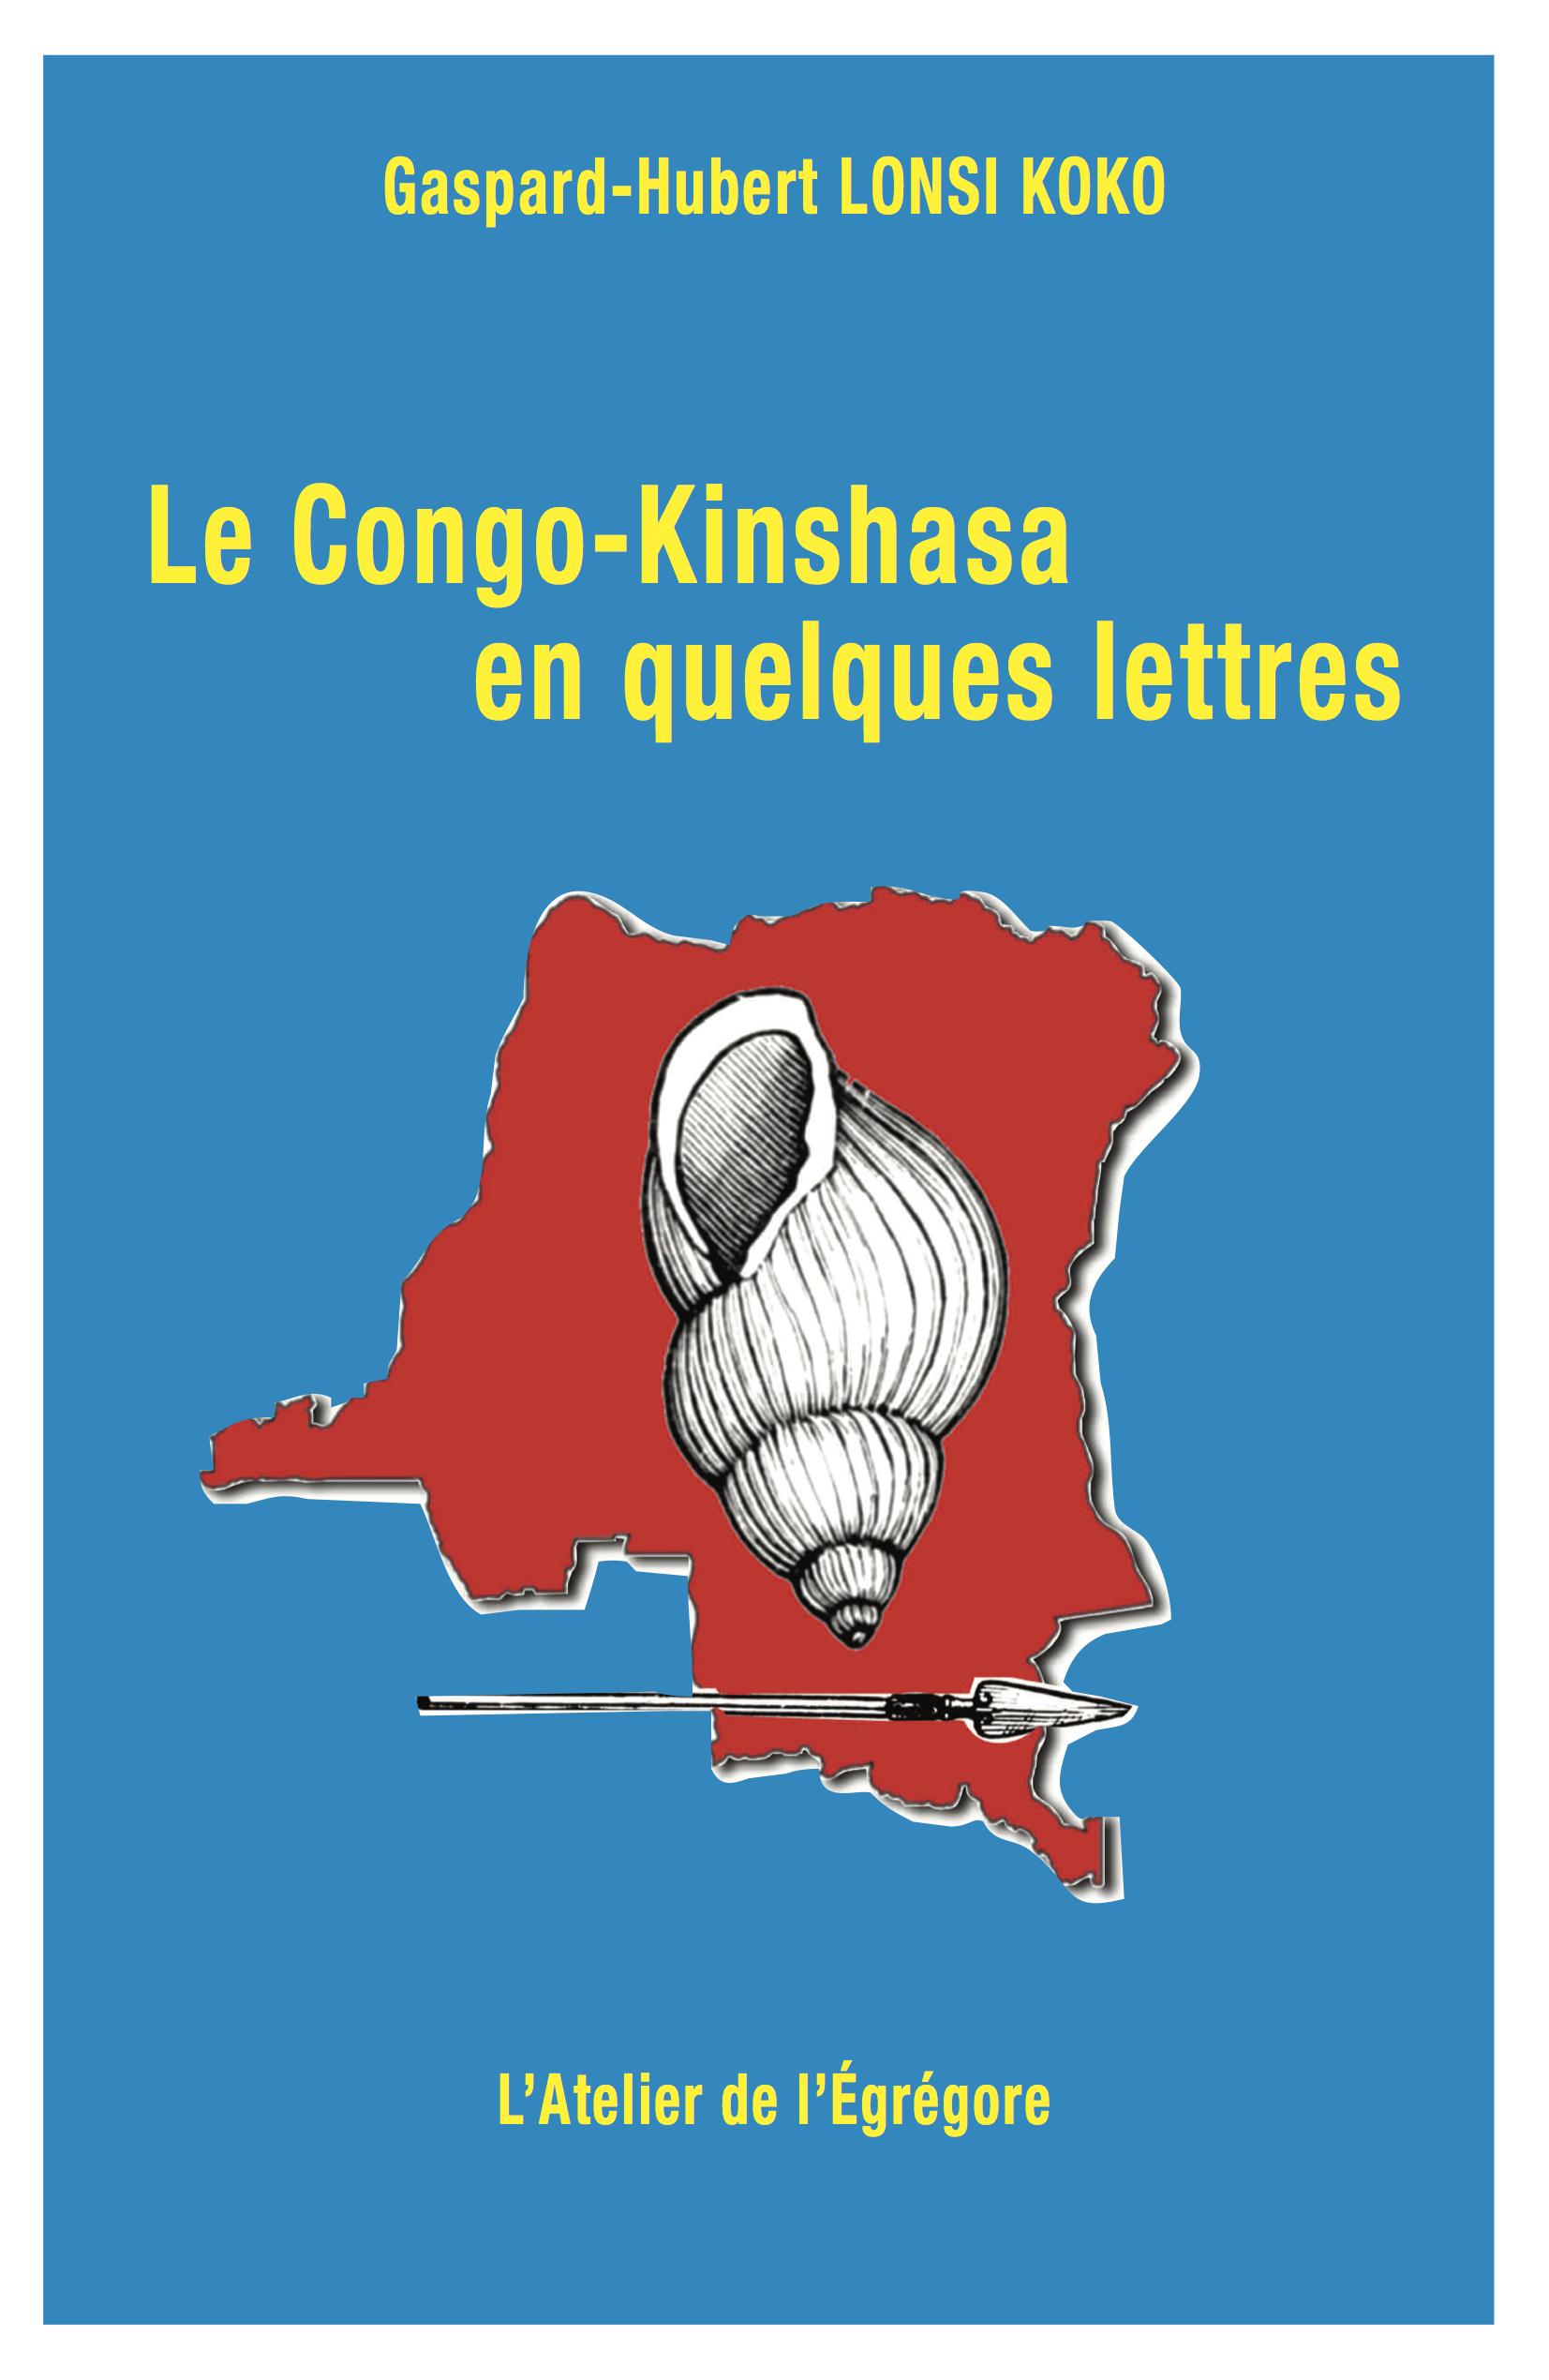 Le Congo-Kinshasa en quelques lettres